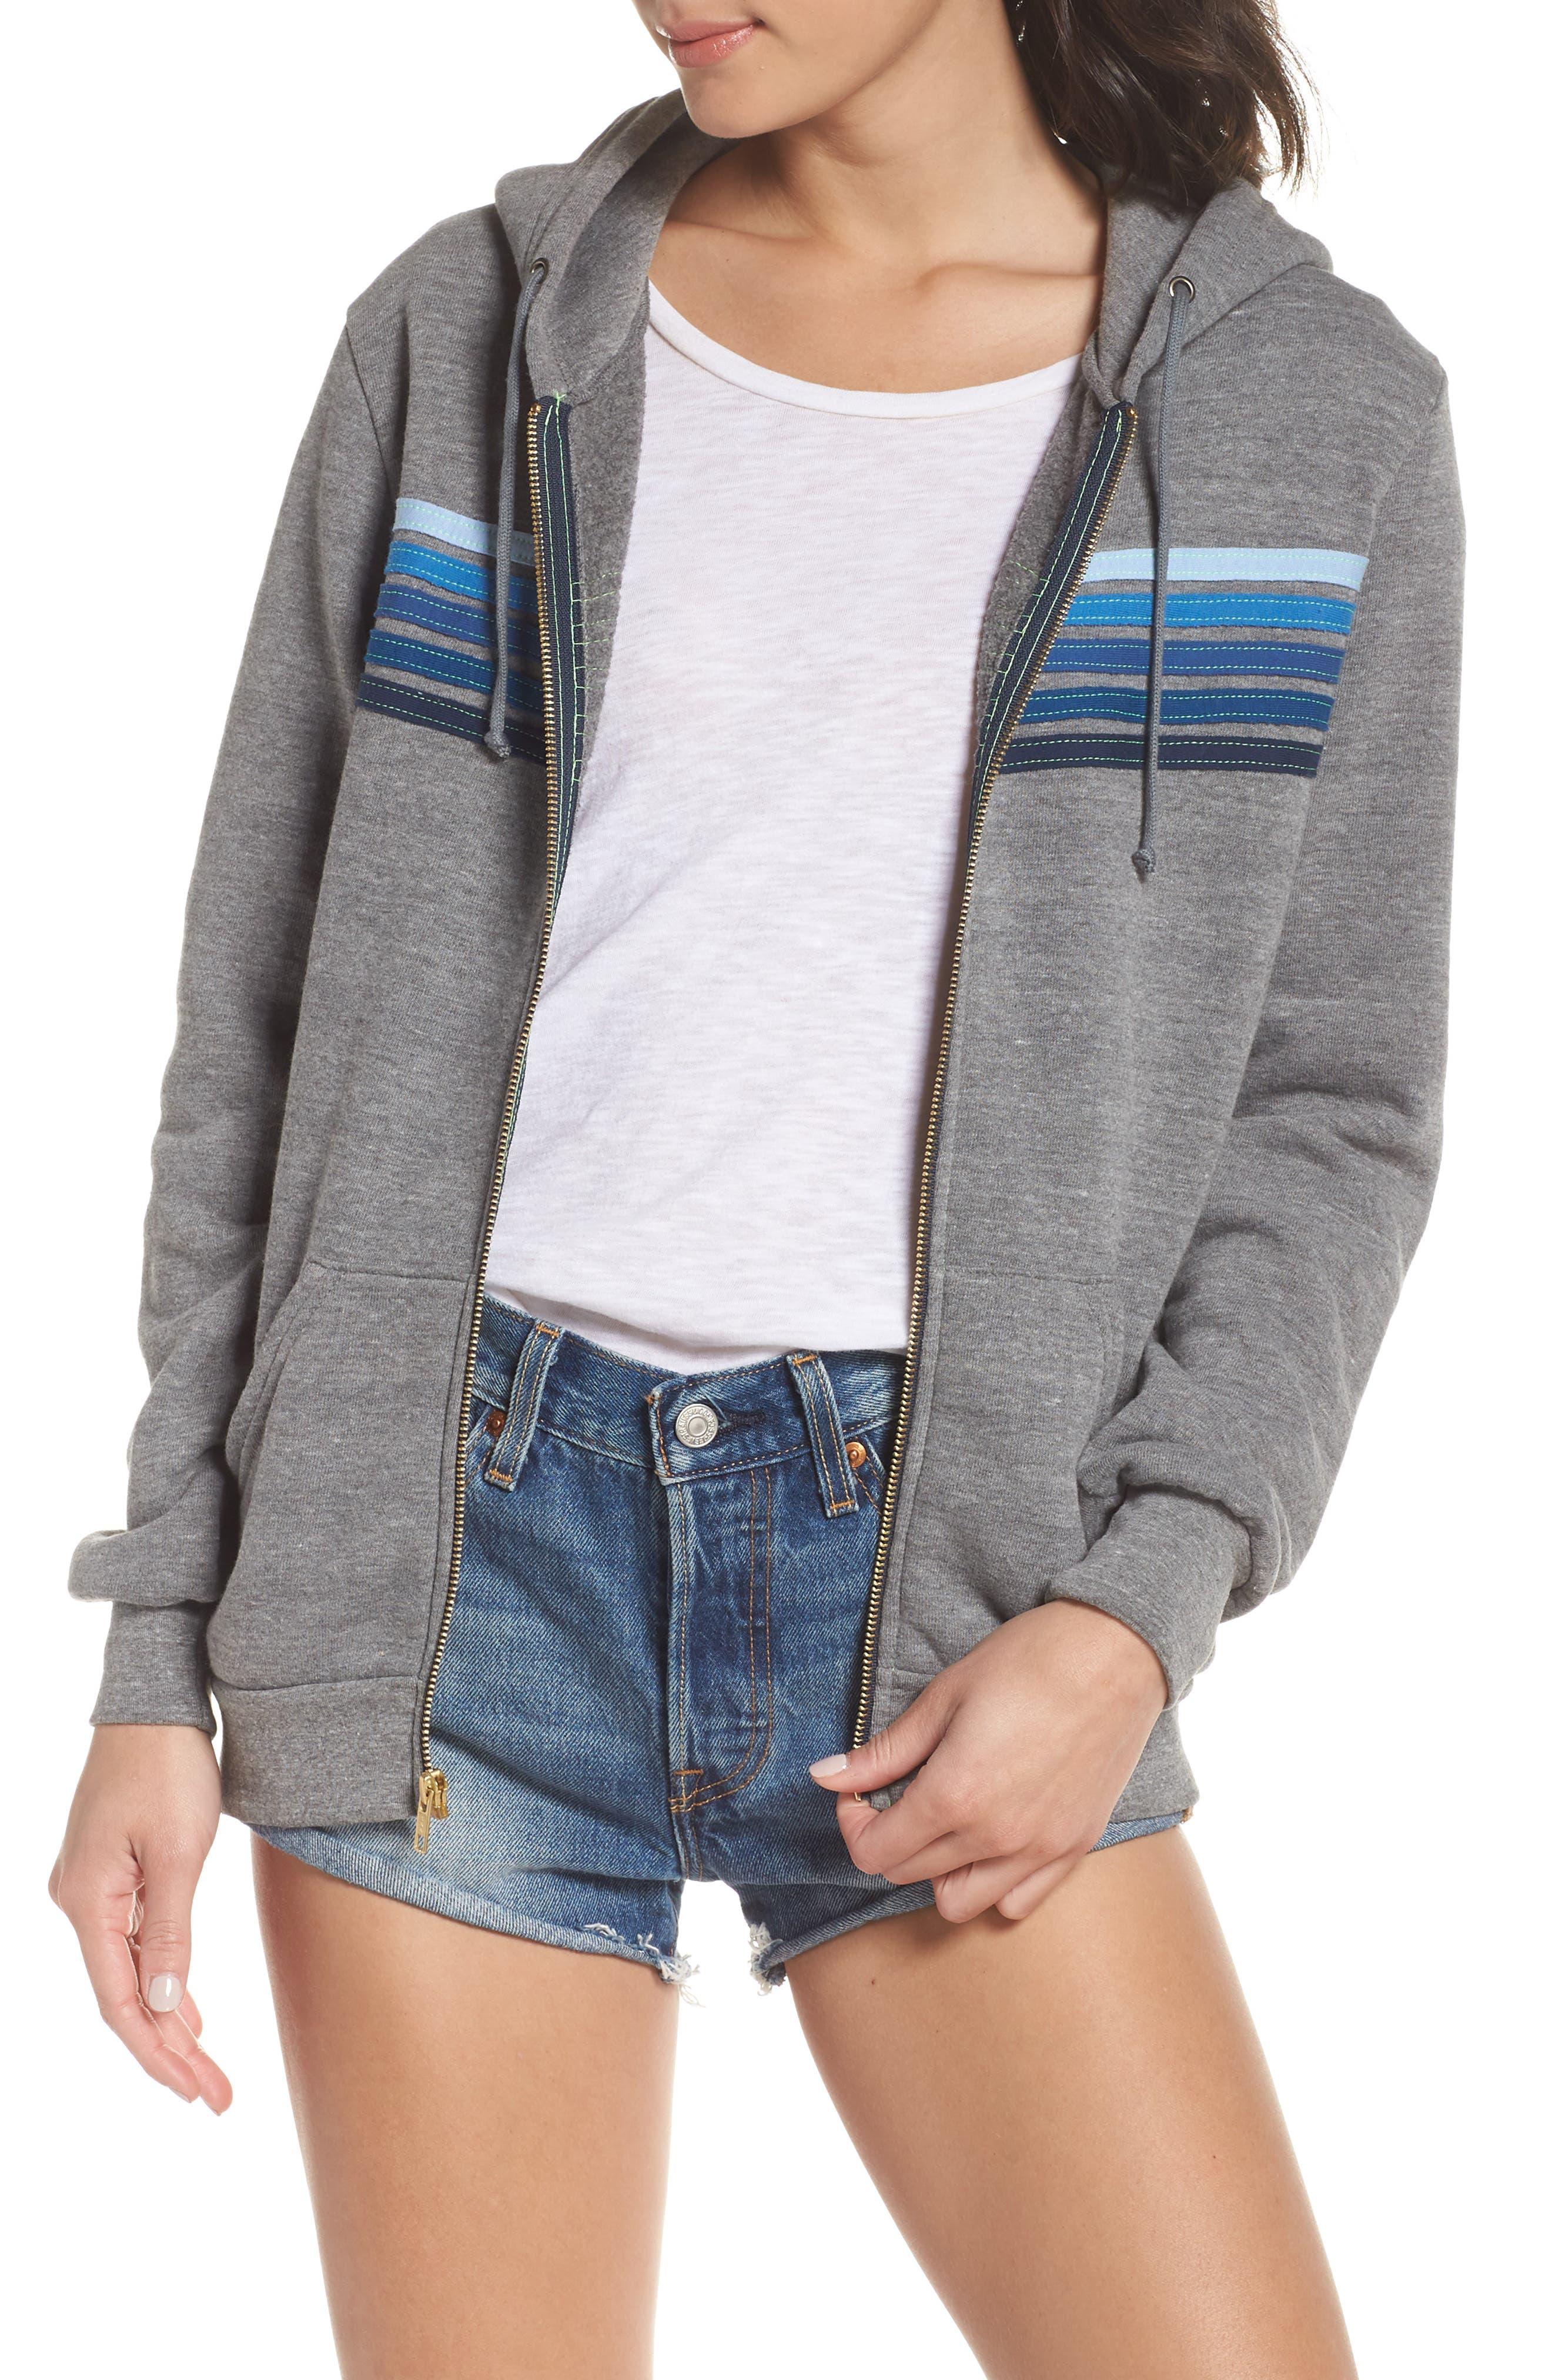 5-Stripe Zip Hoodie,                         Main,                         color, Heather Grey/ Blue Stripes